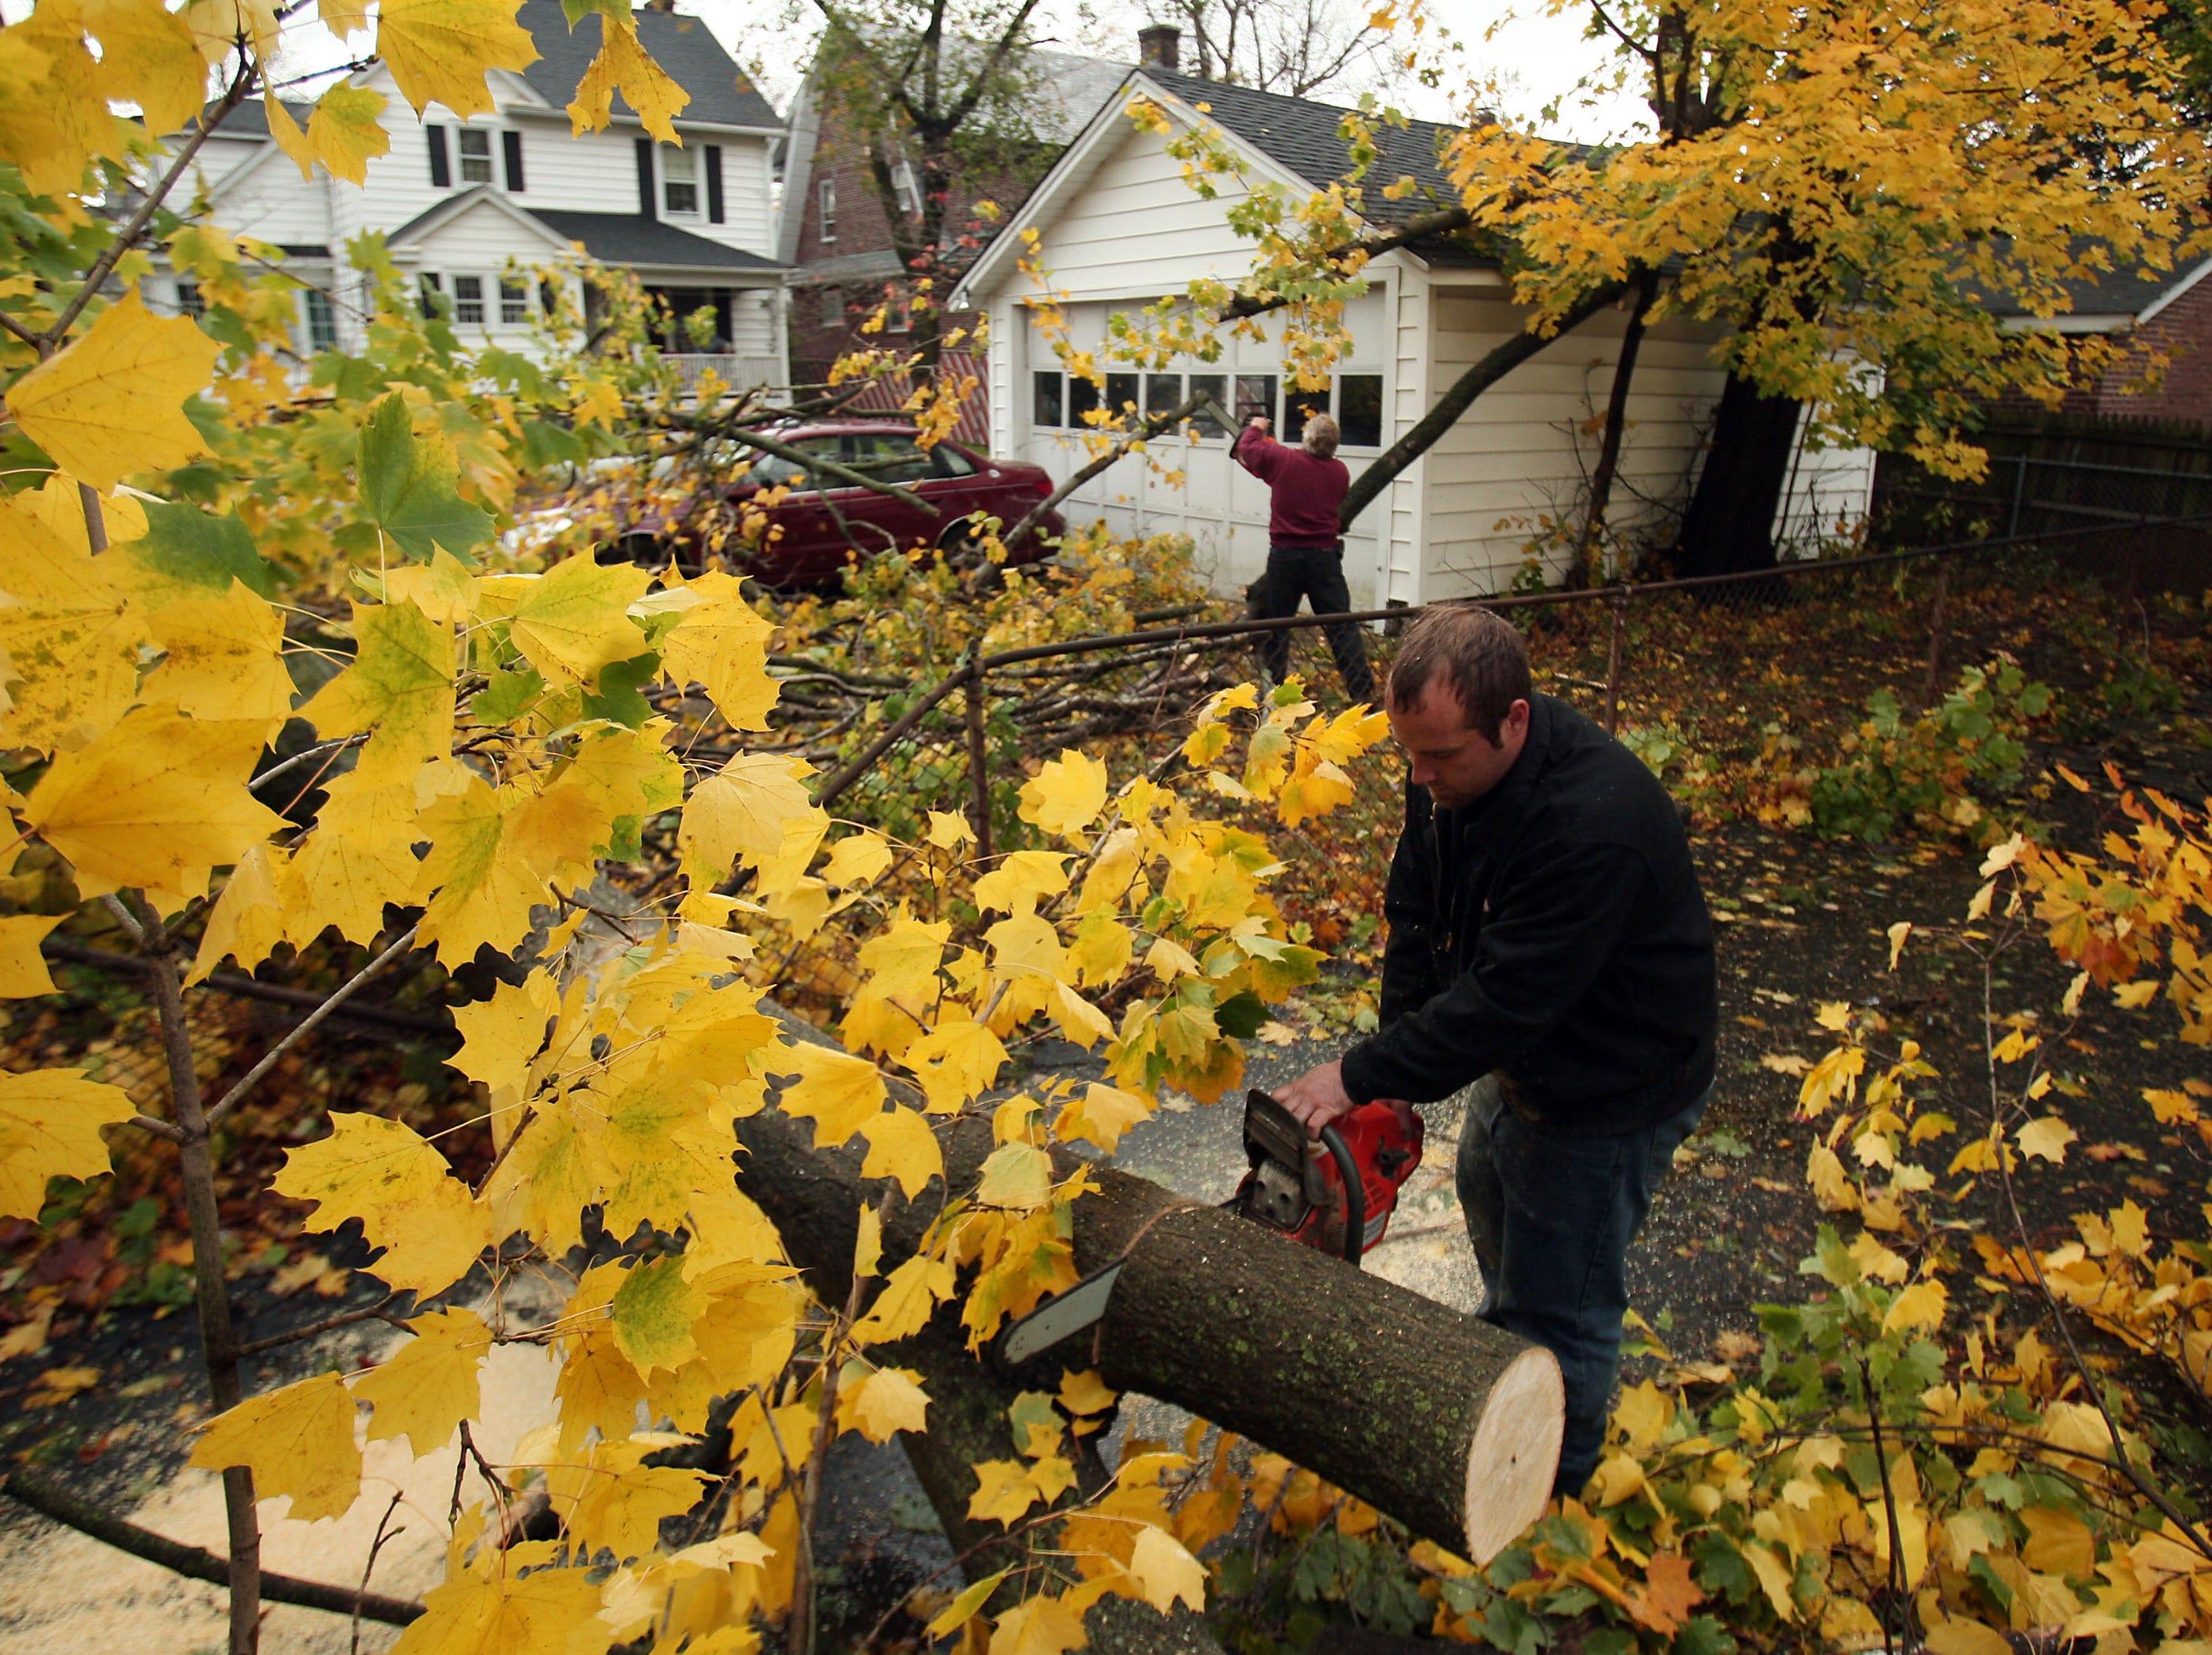 Morristown, NJ-- October 30, 2012--Steve Penzenik of Roxbury Area damage aftermath from Hurricane Sandy. Bob Karp/Staff Photographer/DAILY RECORD